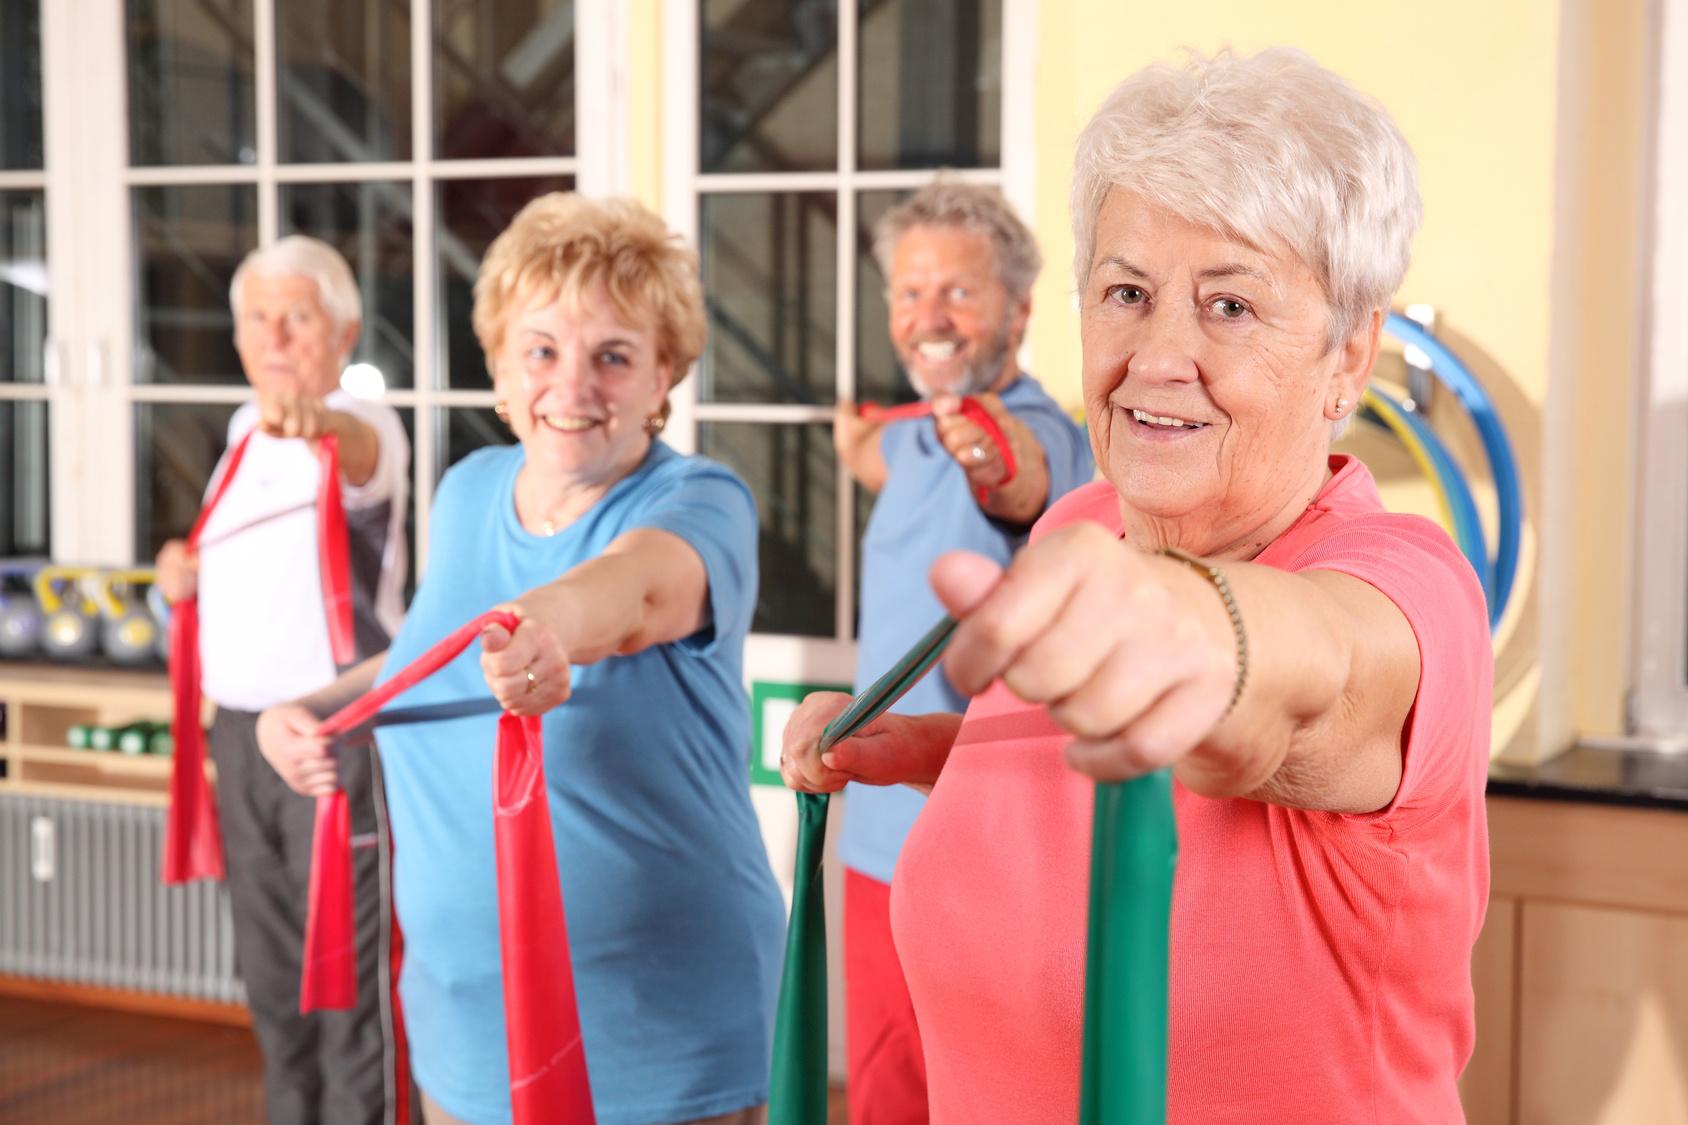 senioren-gymnastik-fitness-sport-studio-strechband-theraband